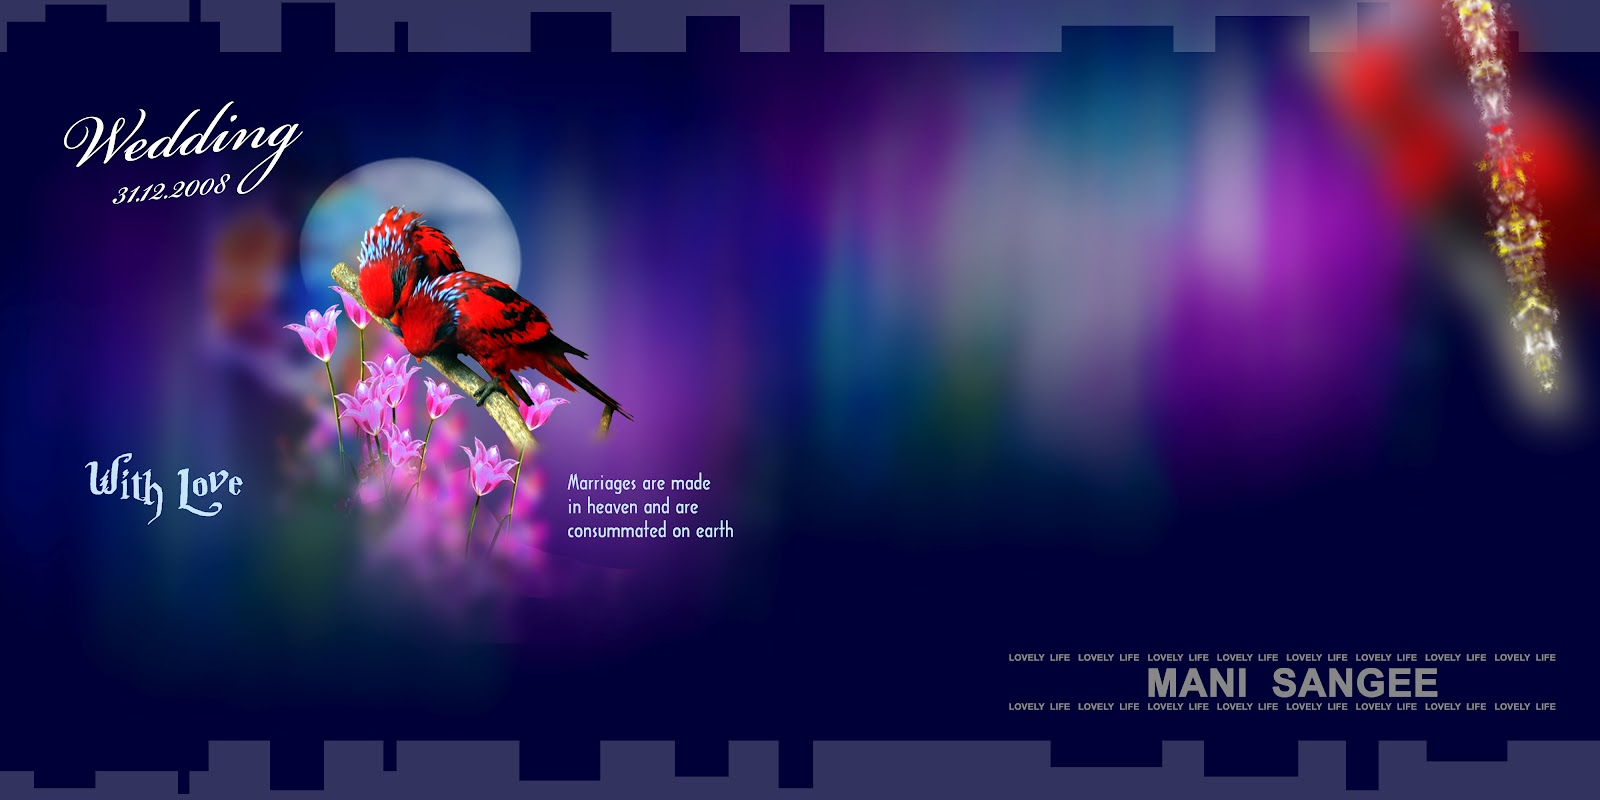 13 Background Psd Download Images Studio Background Psd Free Download 12x30 Album Karizma Psd Free Download And Bubbles Psd Free Download Newdesignfile Com